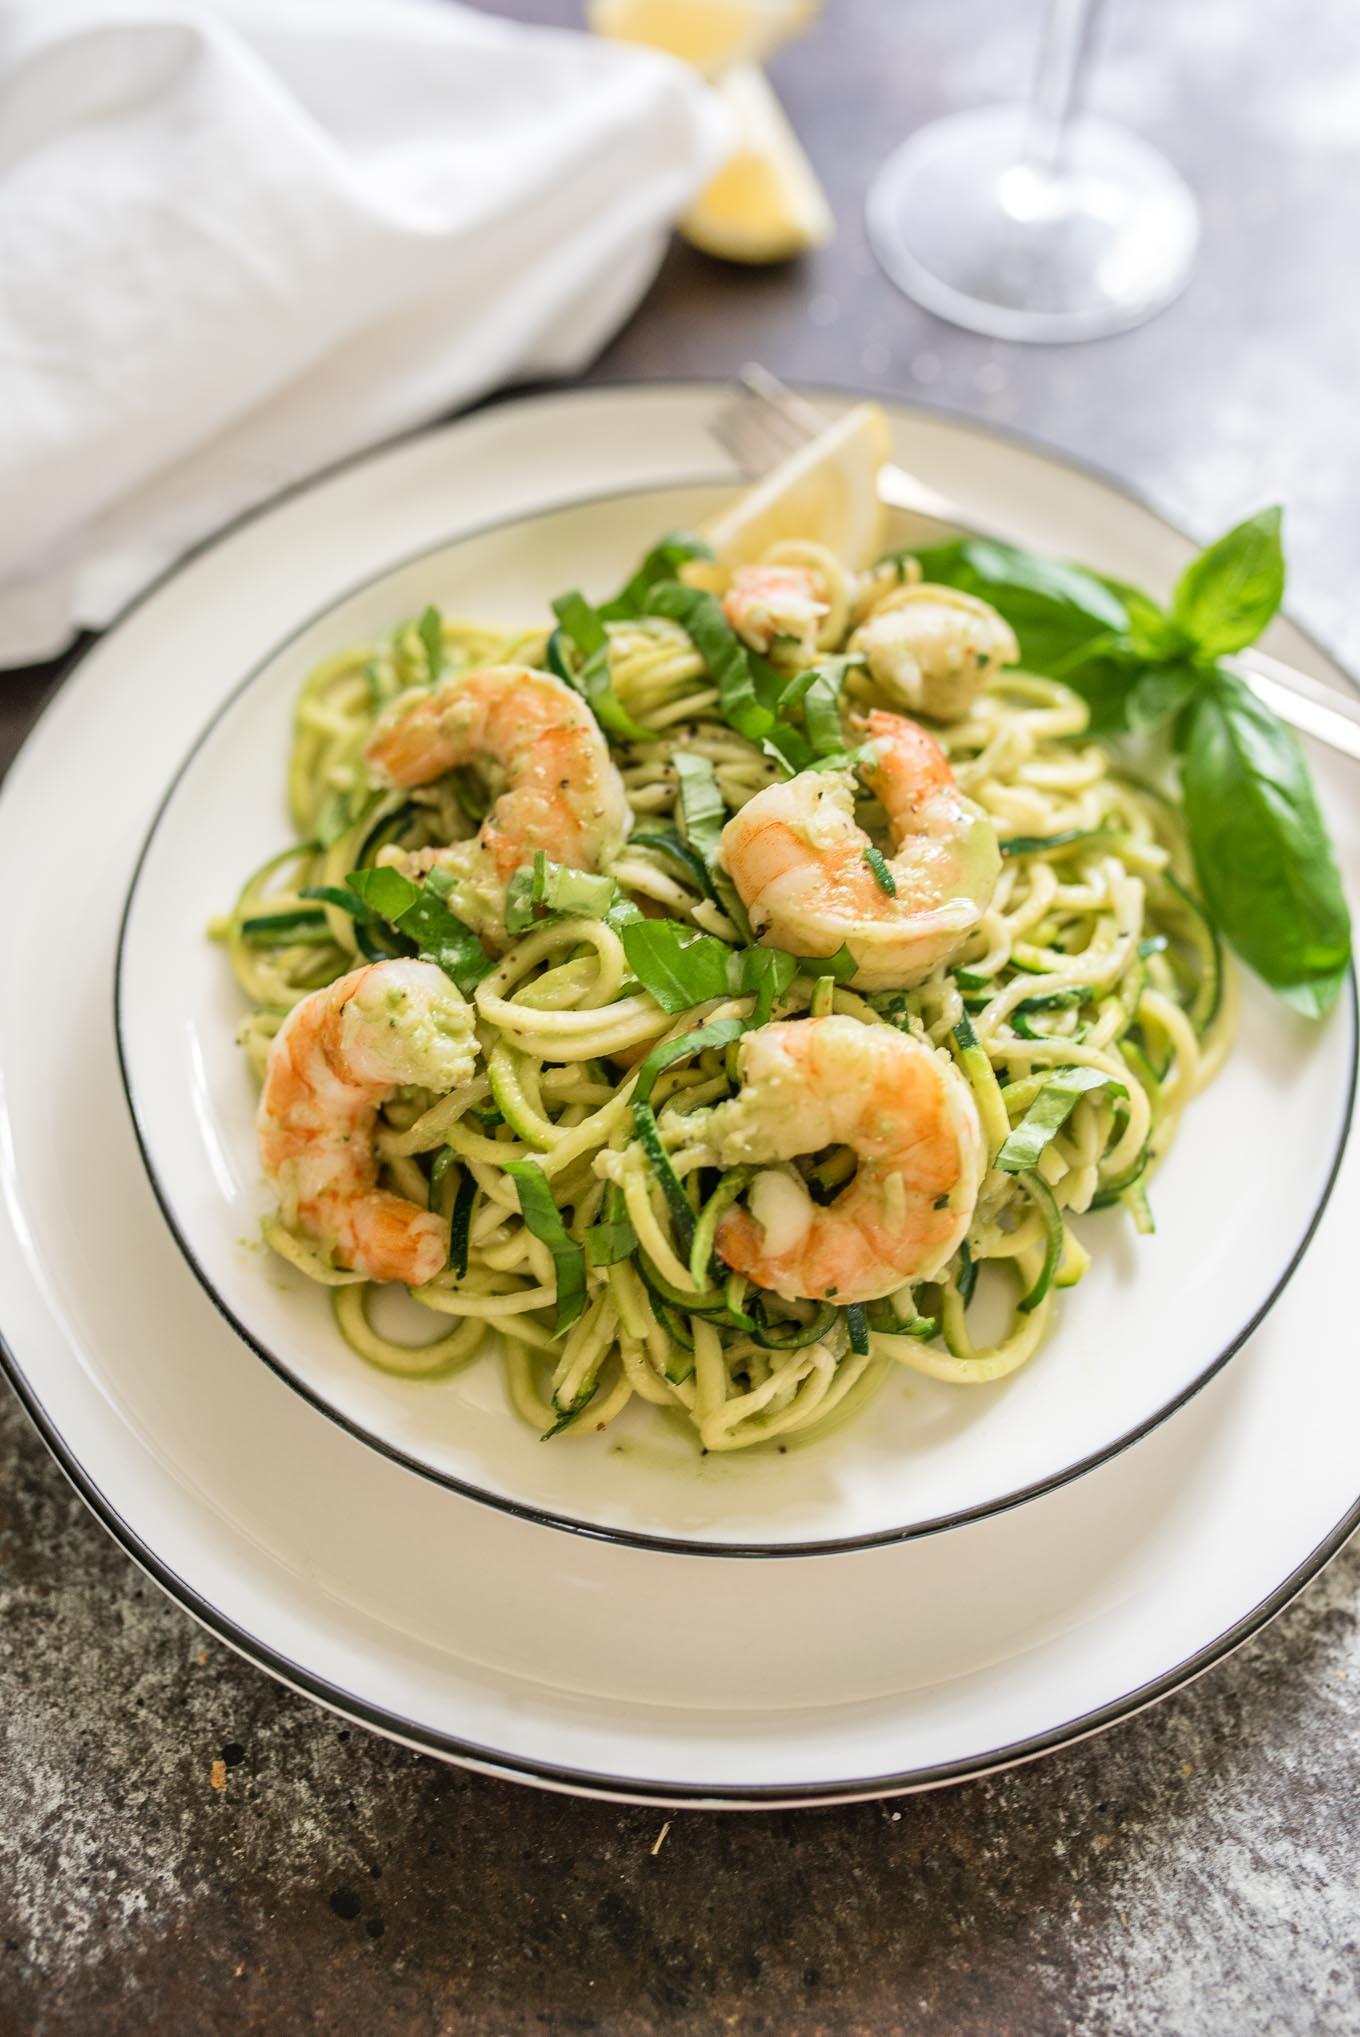 Shrimp And Zucchini  Creamy Basil Zucchini Noodles with Shrimp